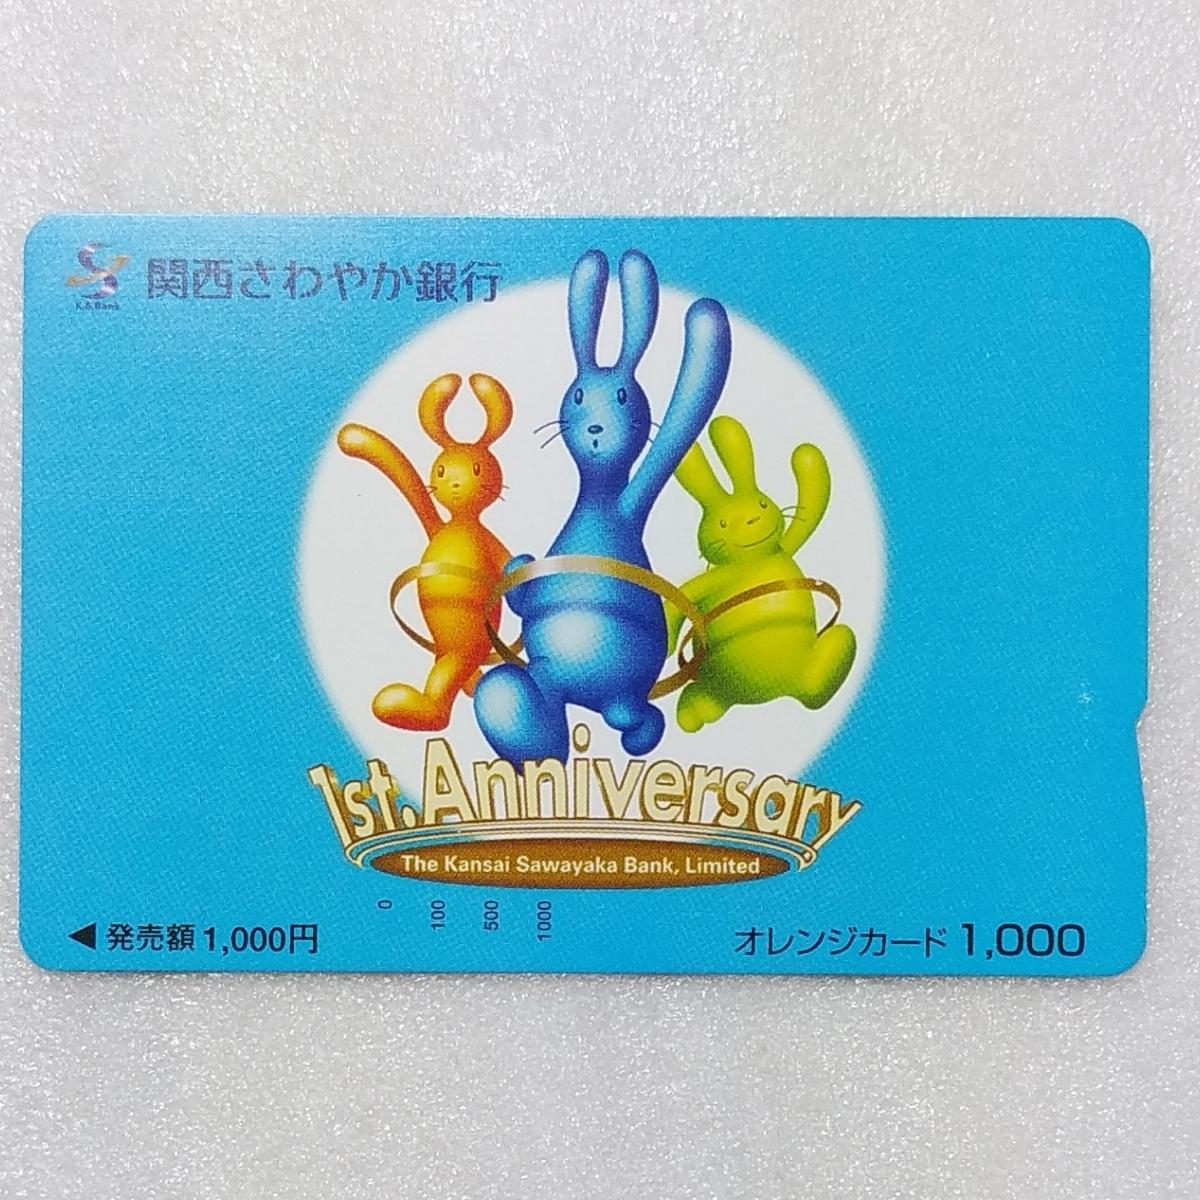 JR西日本オレンジカード 関西さわやか銀行1周年記念 1000円券 未使用品_画像1